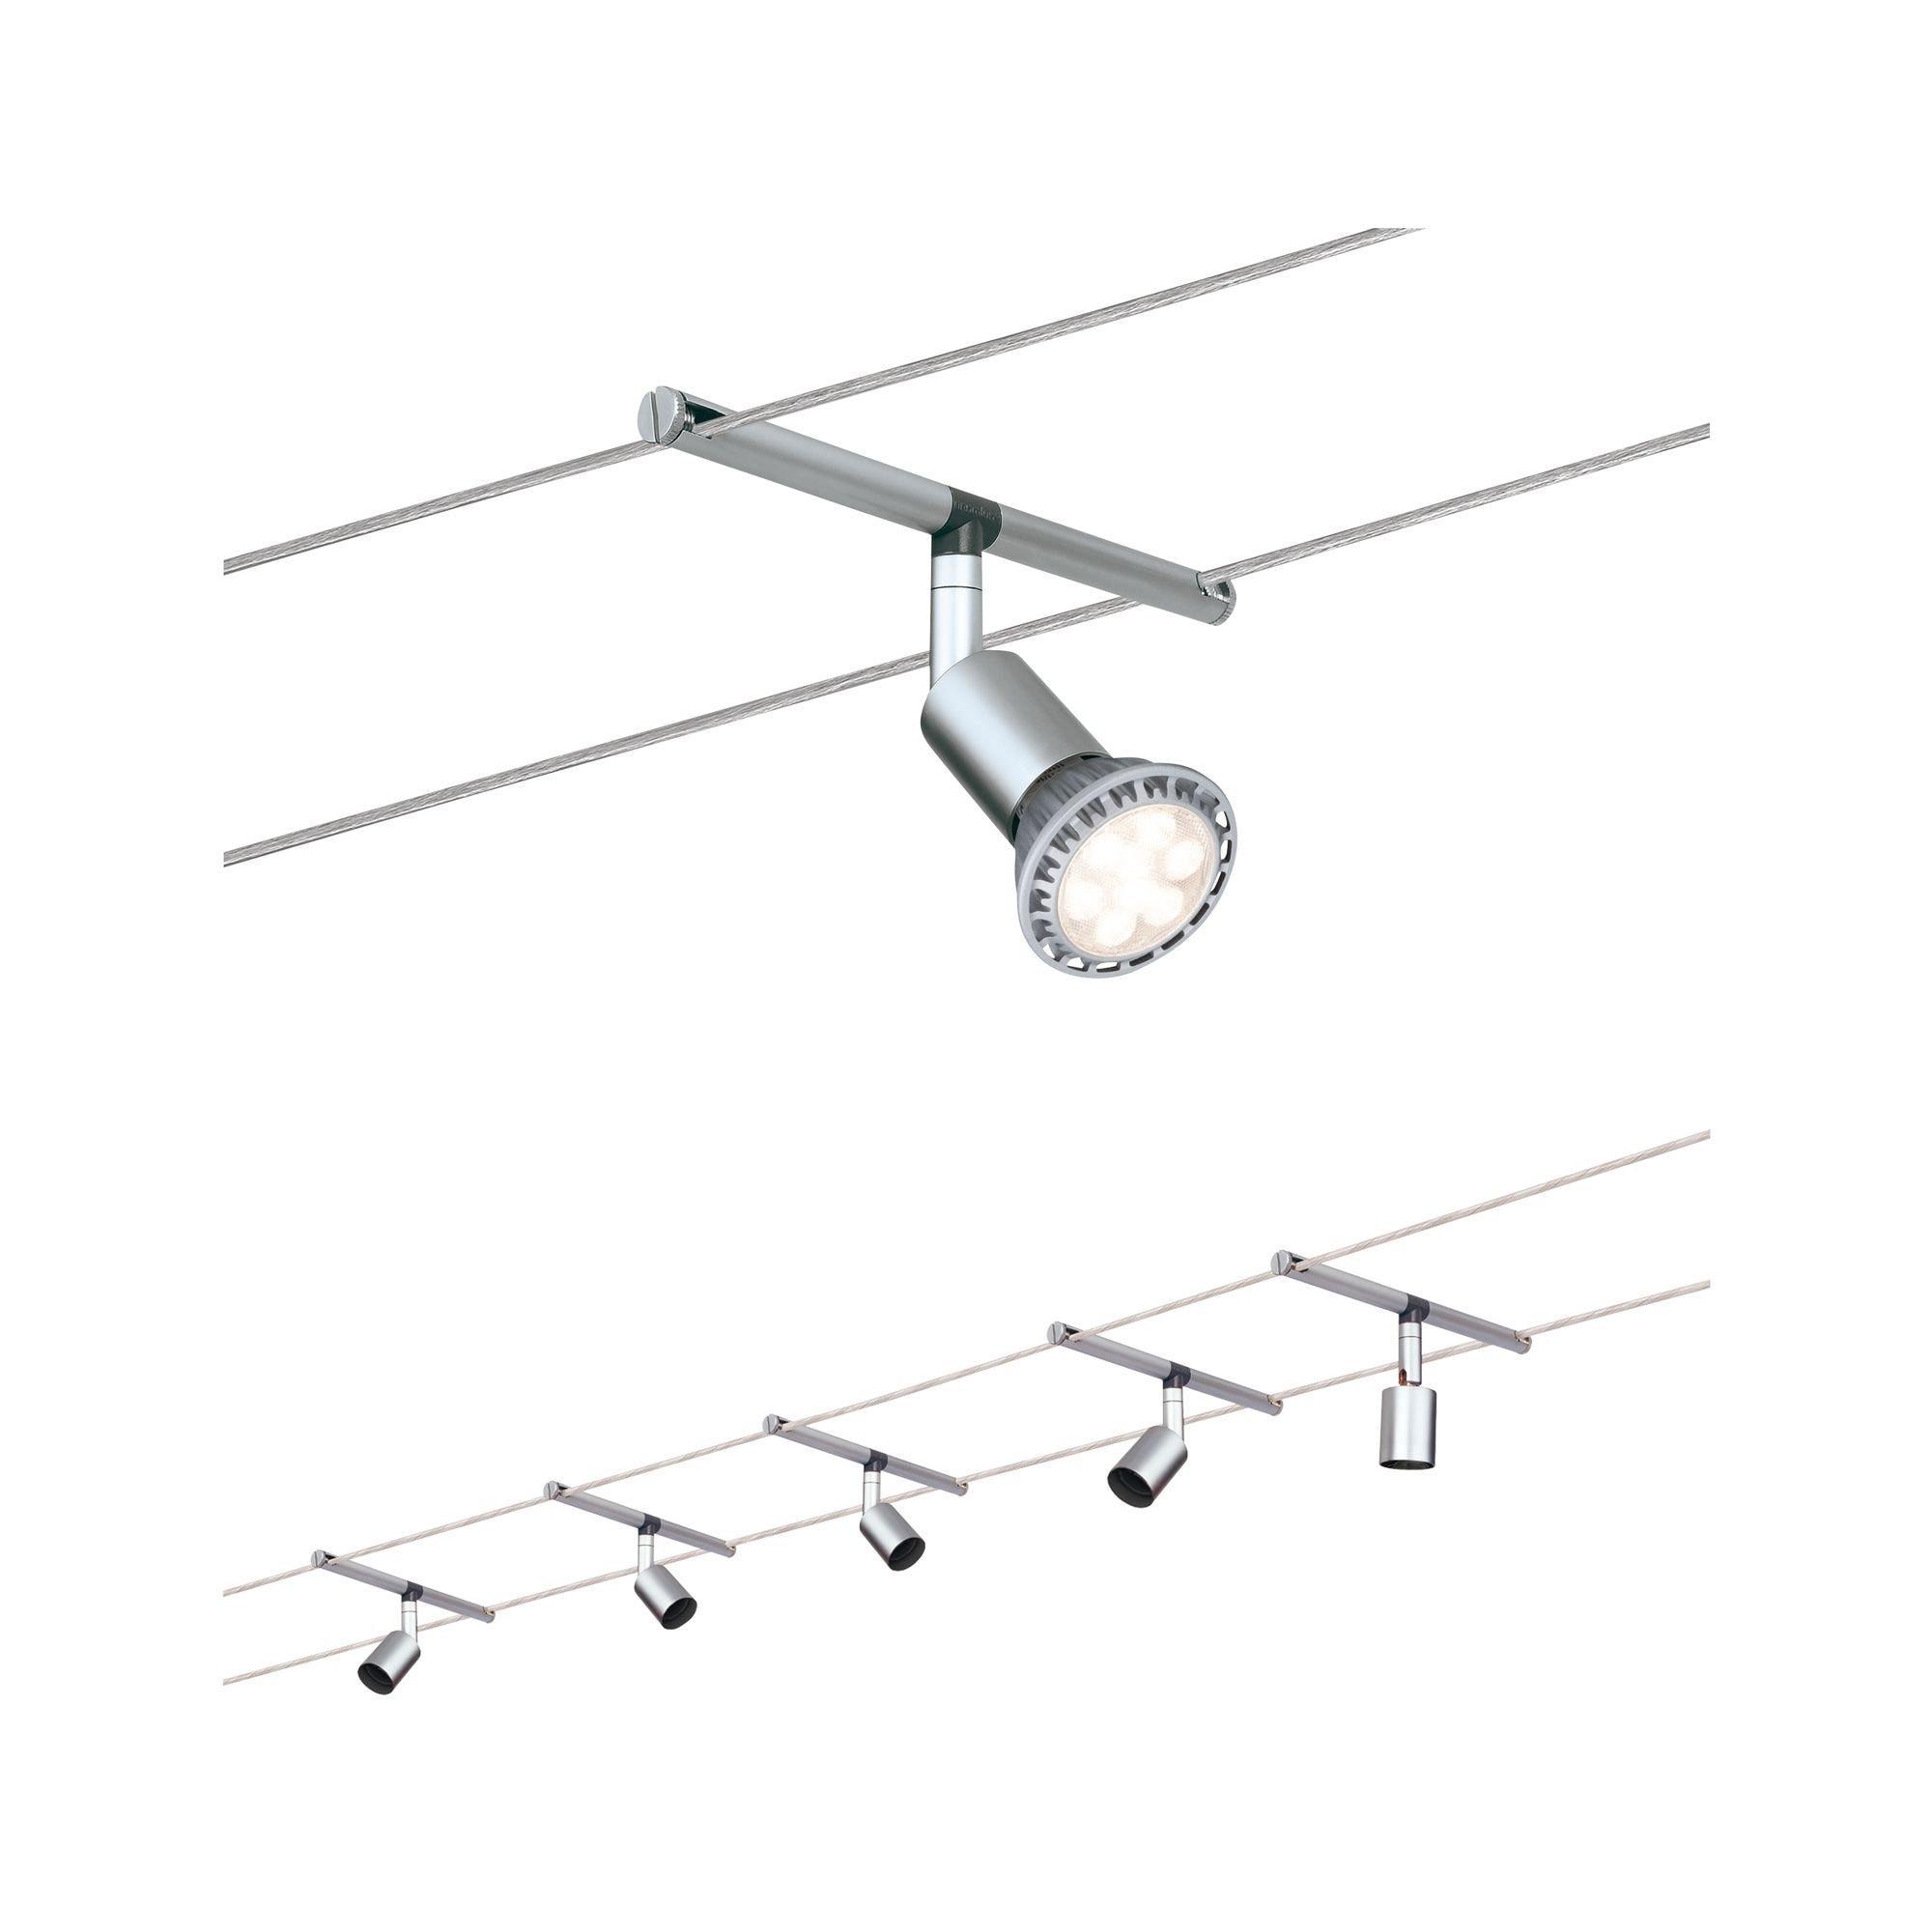 Paulmann LED Deckenleuchte Seilsystem Salt Chrom matt mit 5 Spots max. 10W GU5,3, GU 5,3, 1 St.